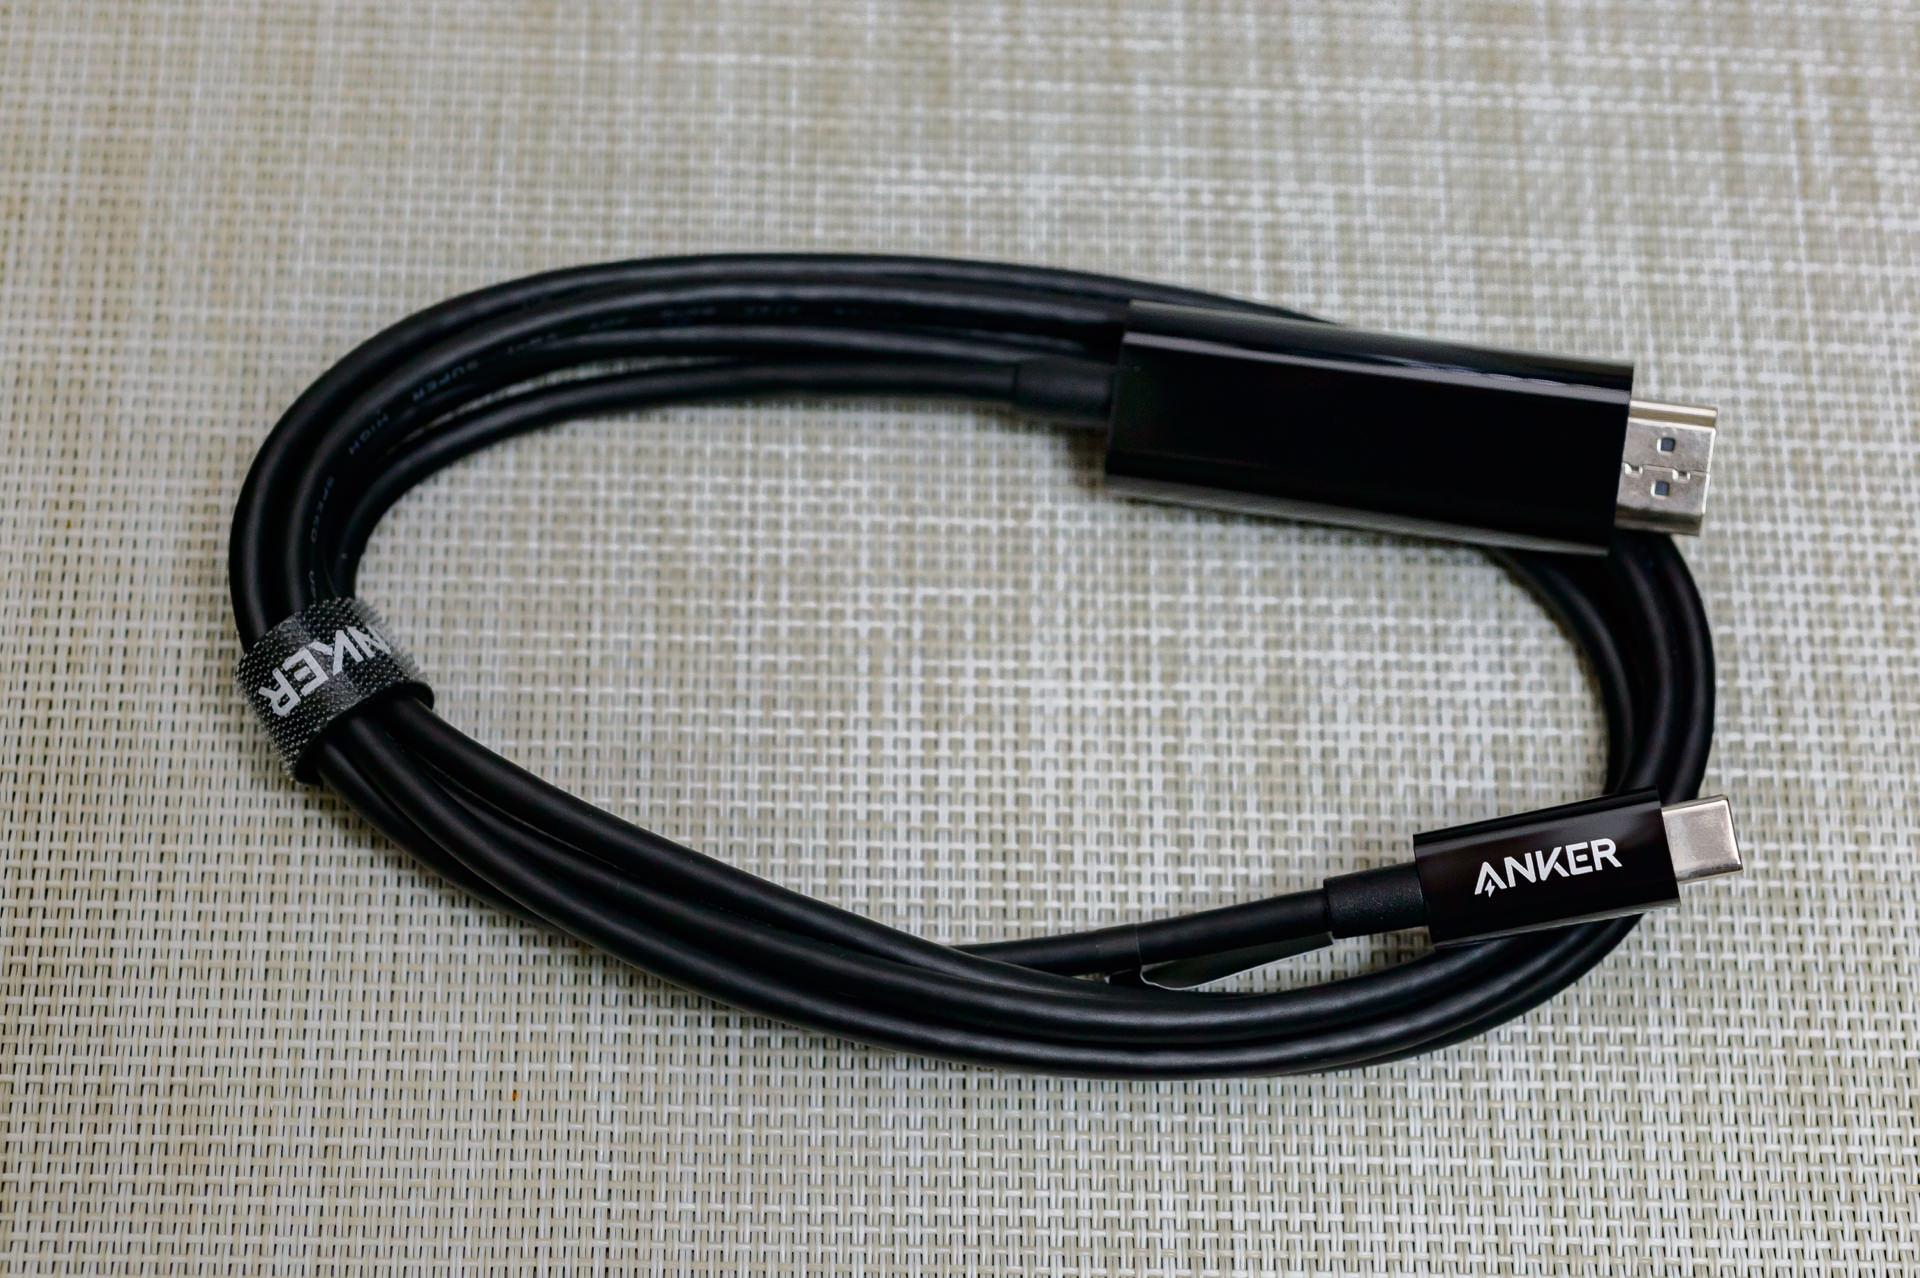 Anker USB-C to HDMIケーブル